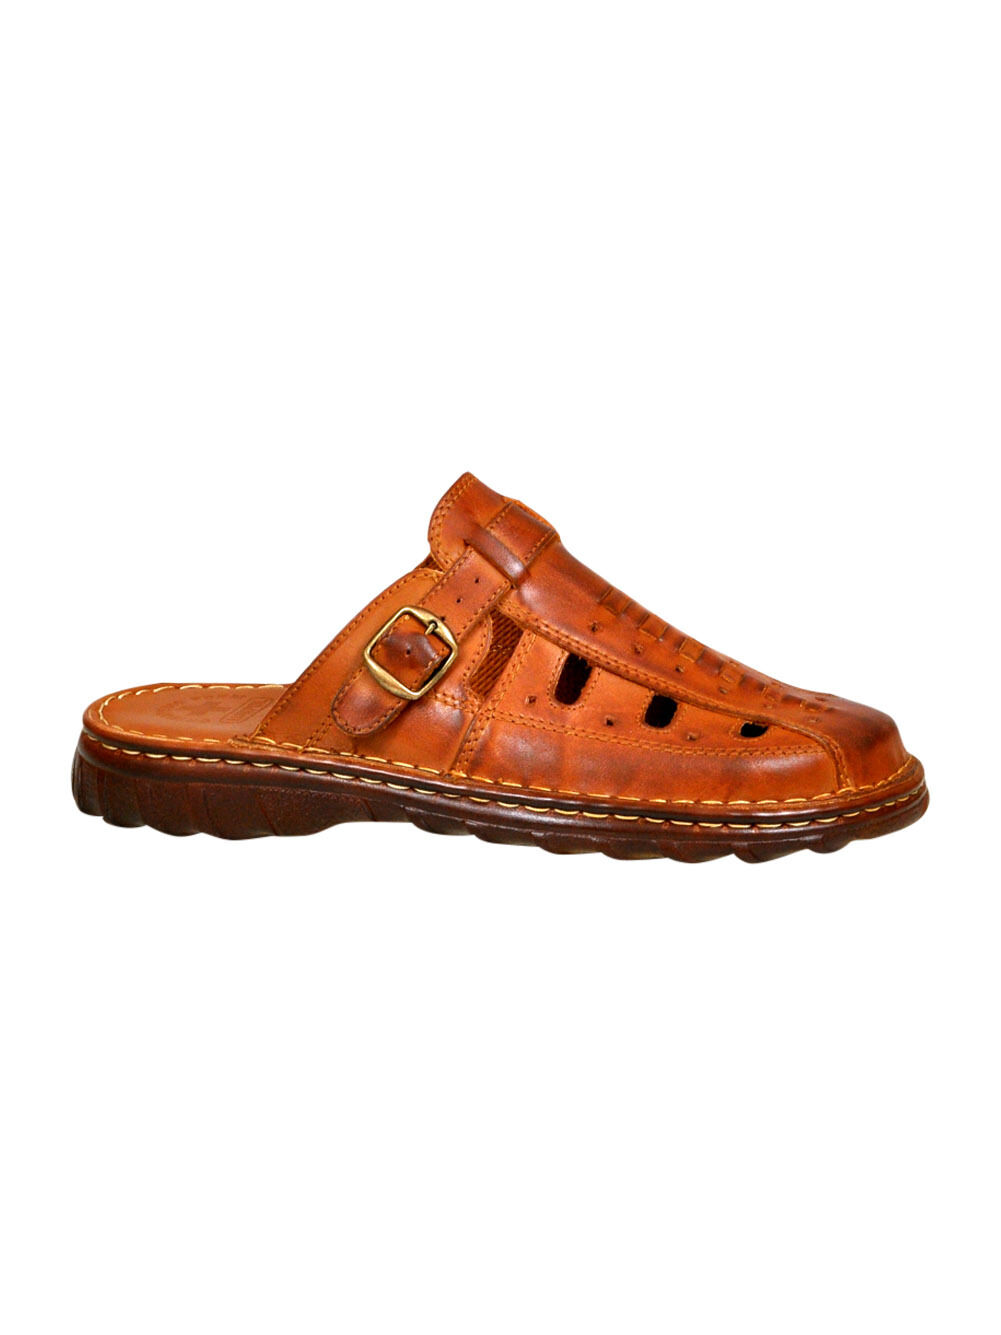 Men Footwear Comfy Orthopedic Sandals Natural Buffalo Leather Shoes UK Size 7-11